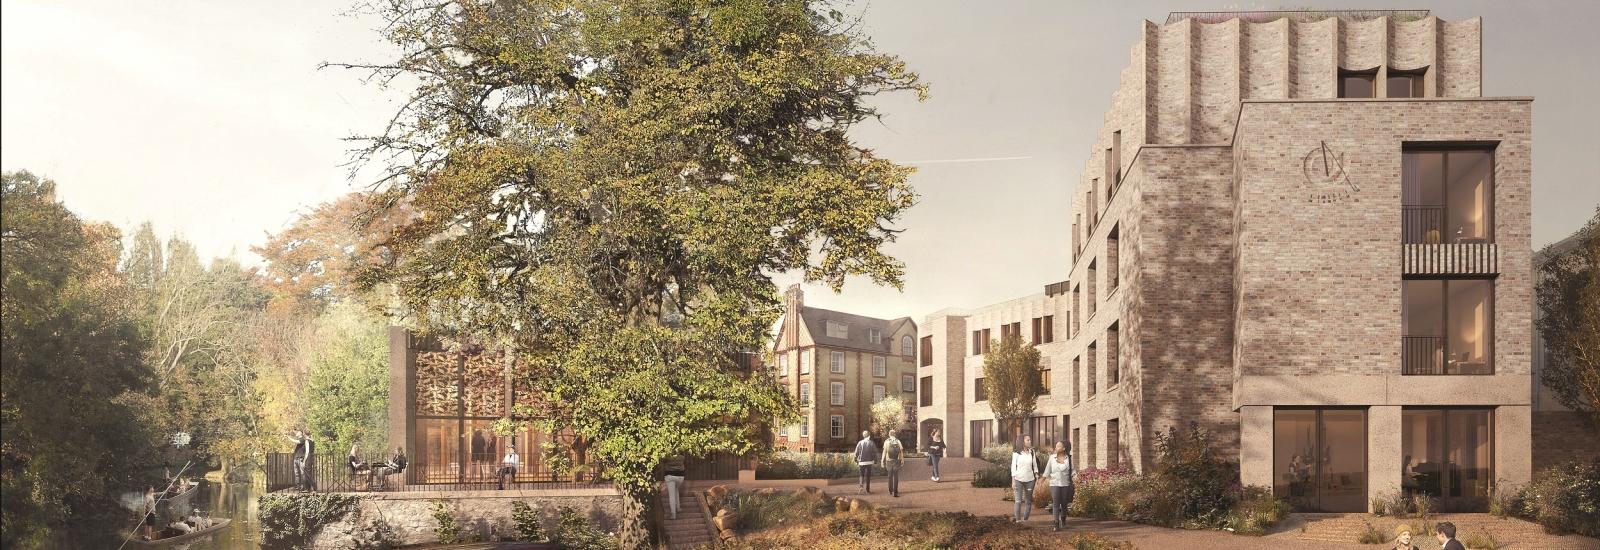 St Hilda's College Building the Future Campaign Update